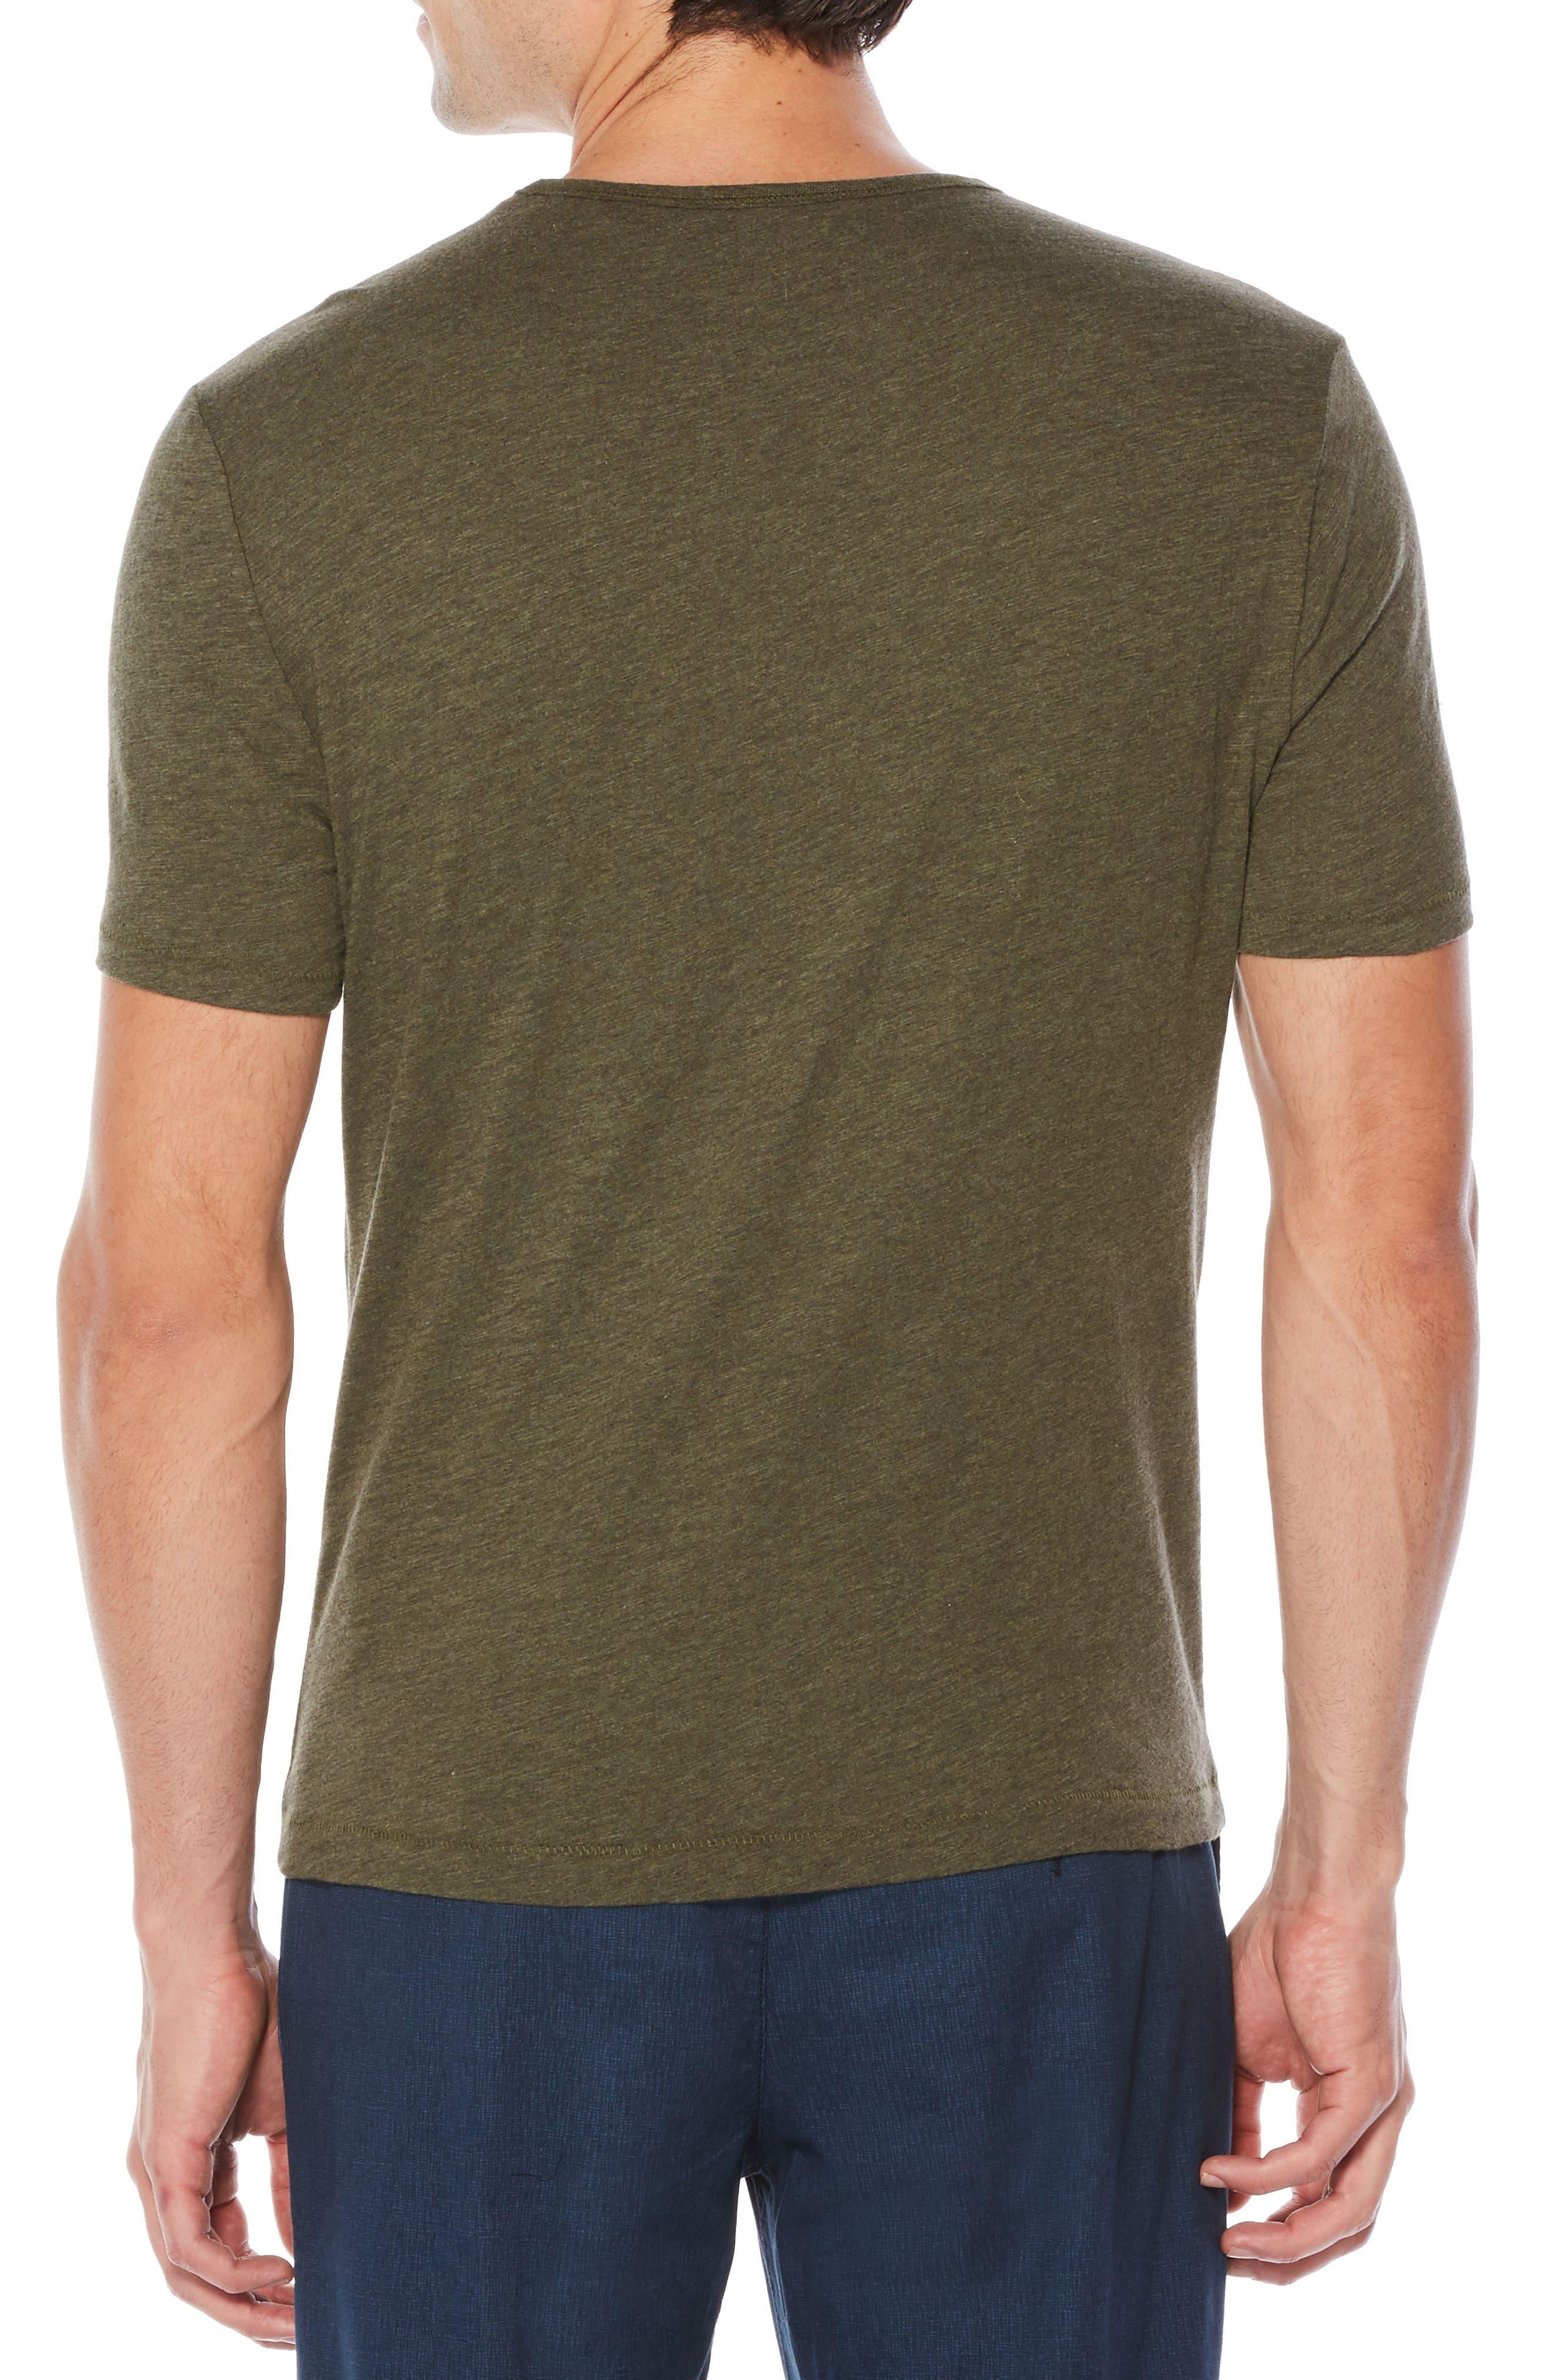 Bing V-Neck T-Shirt,                             Alternate thumbnail 2, color,                             306